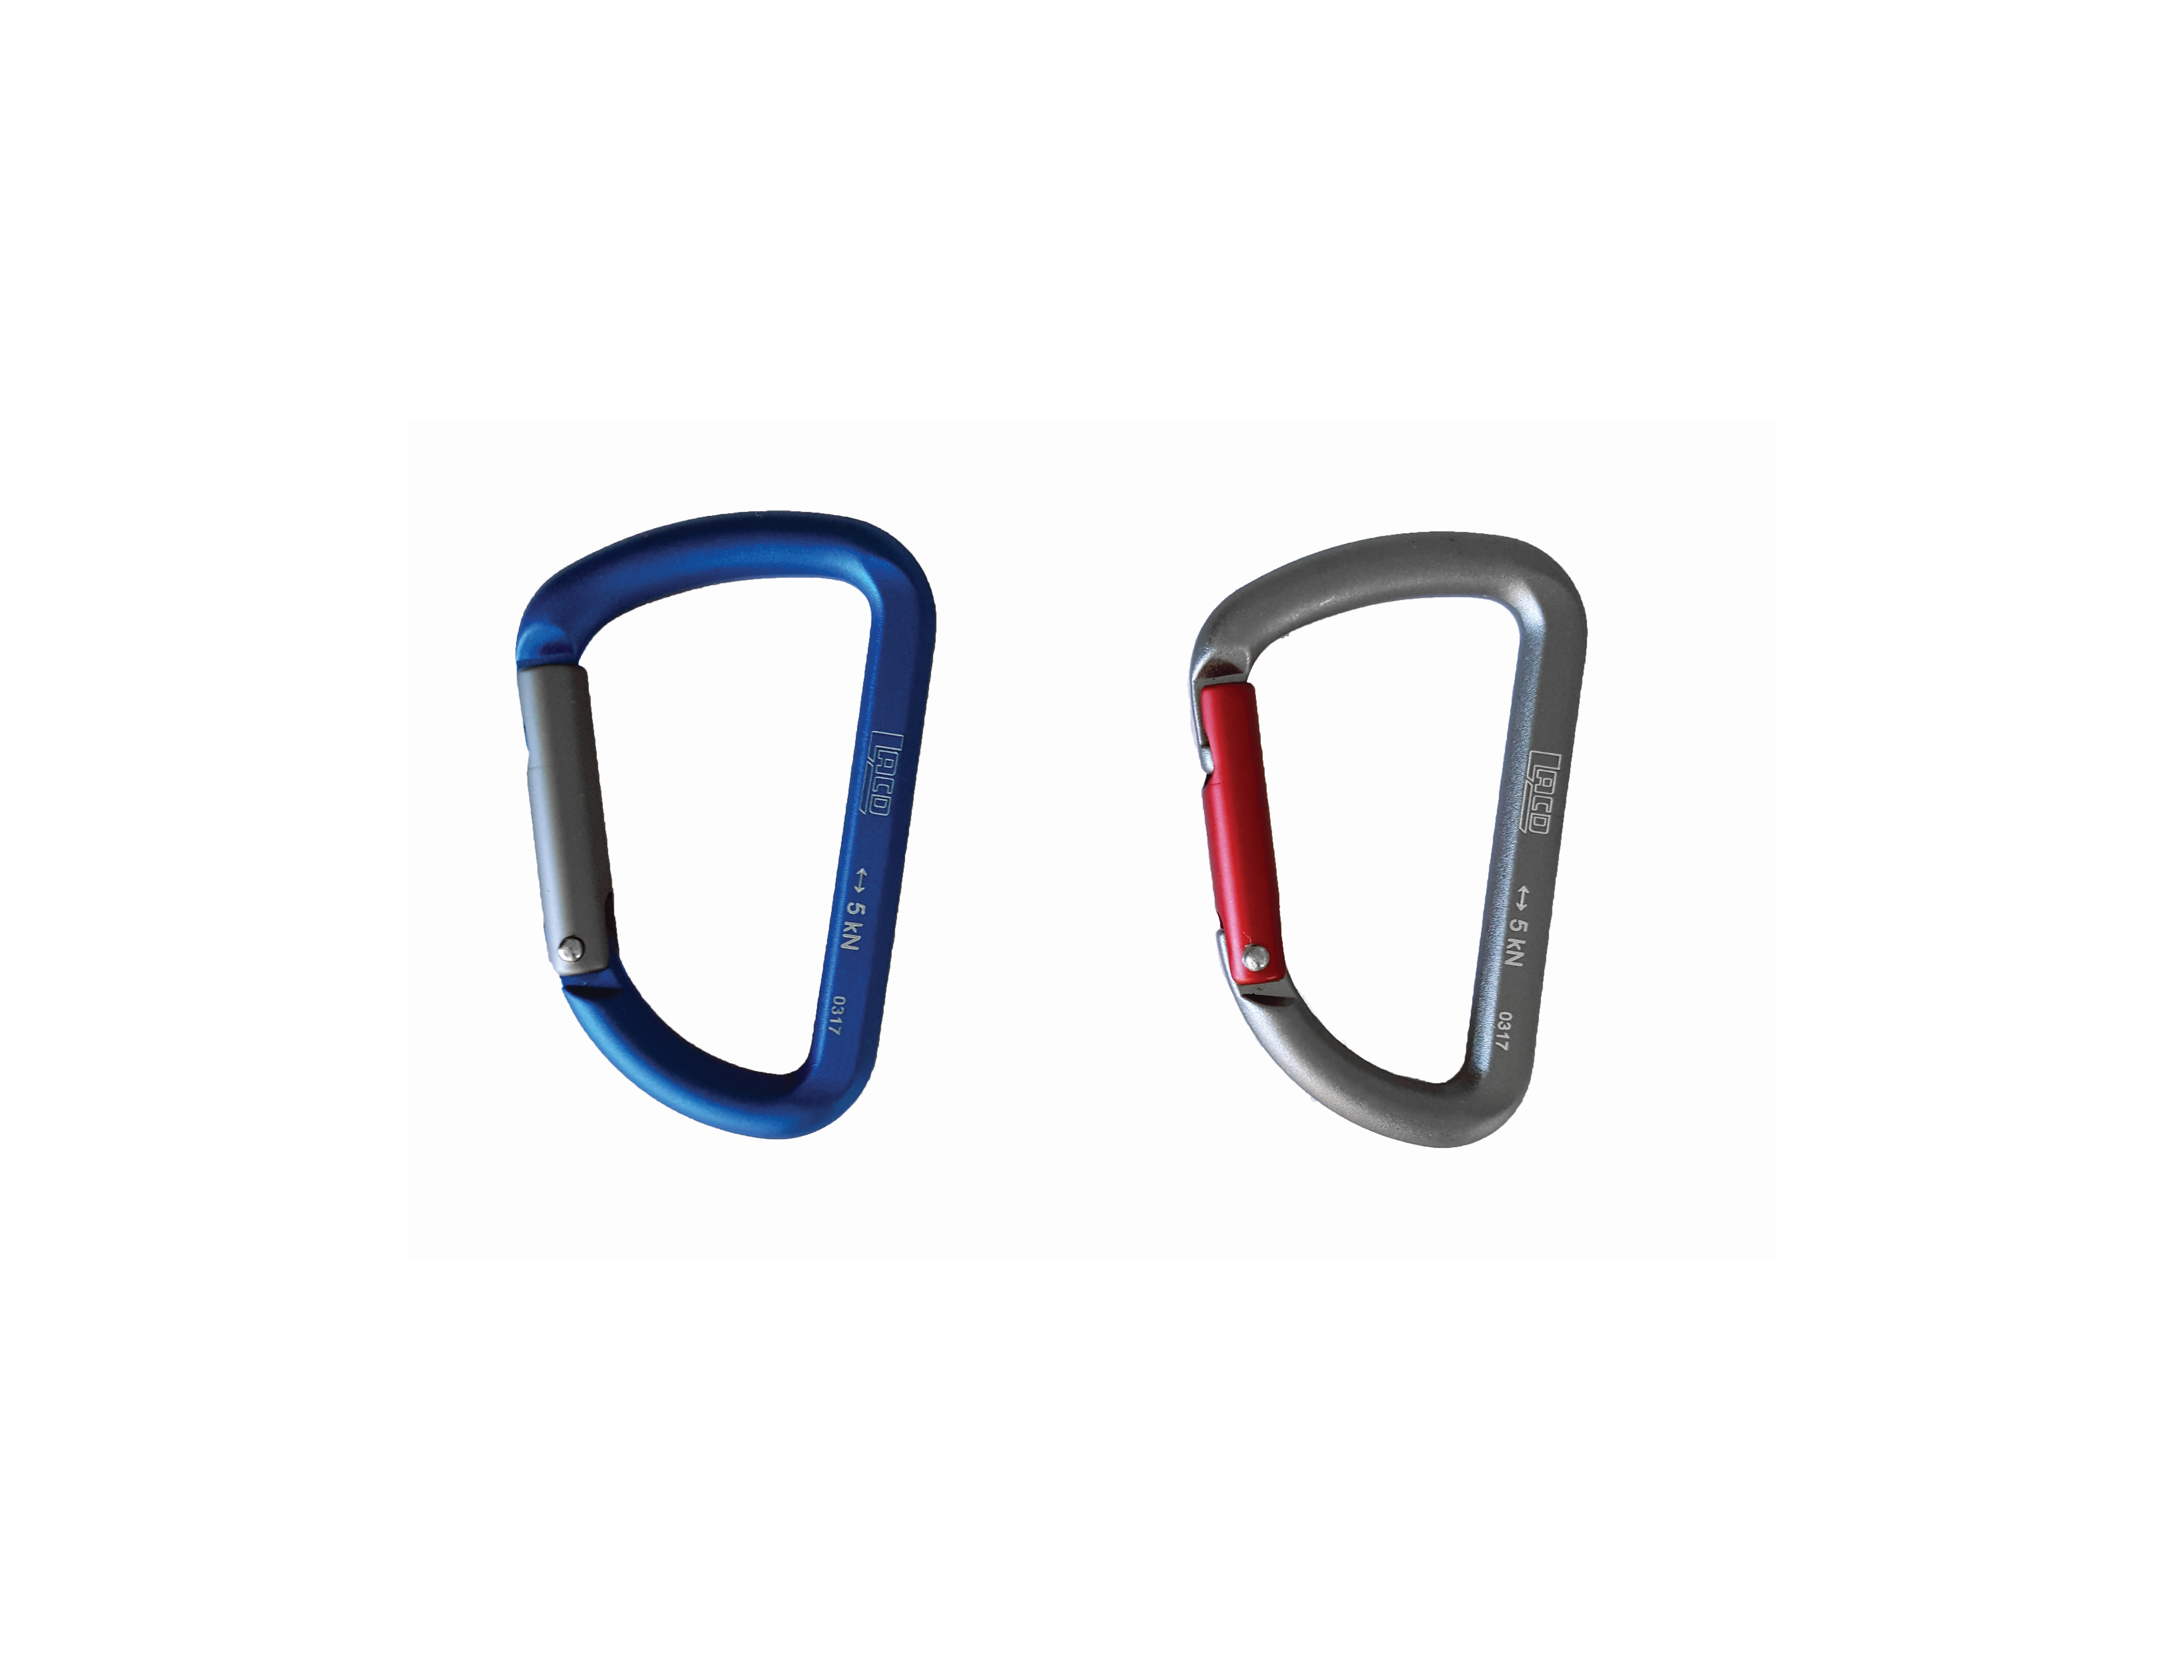 Accessory Biner Straight 65mm